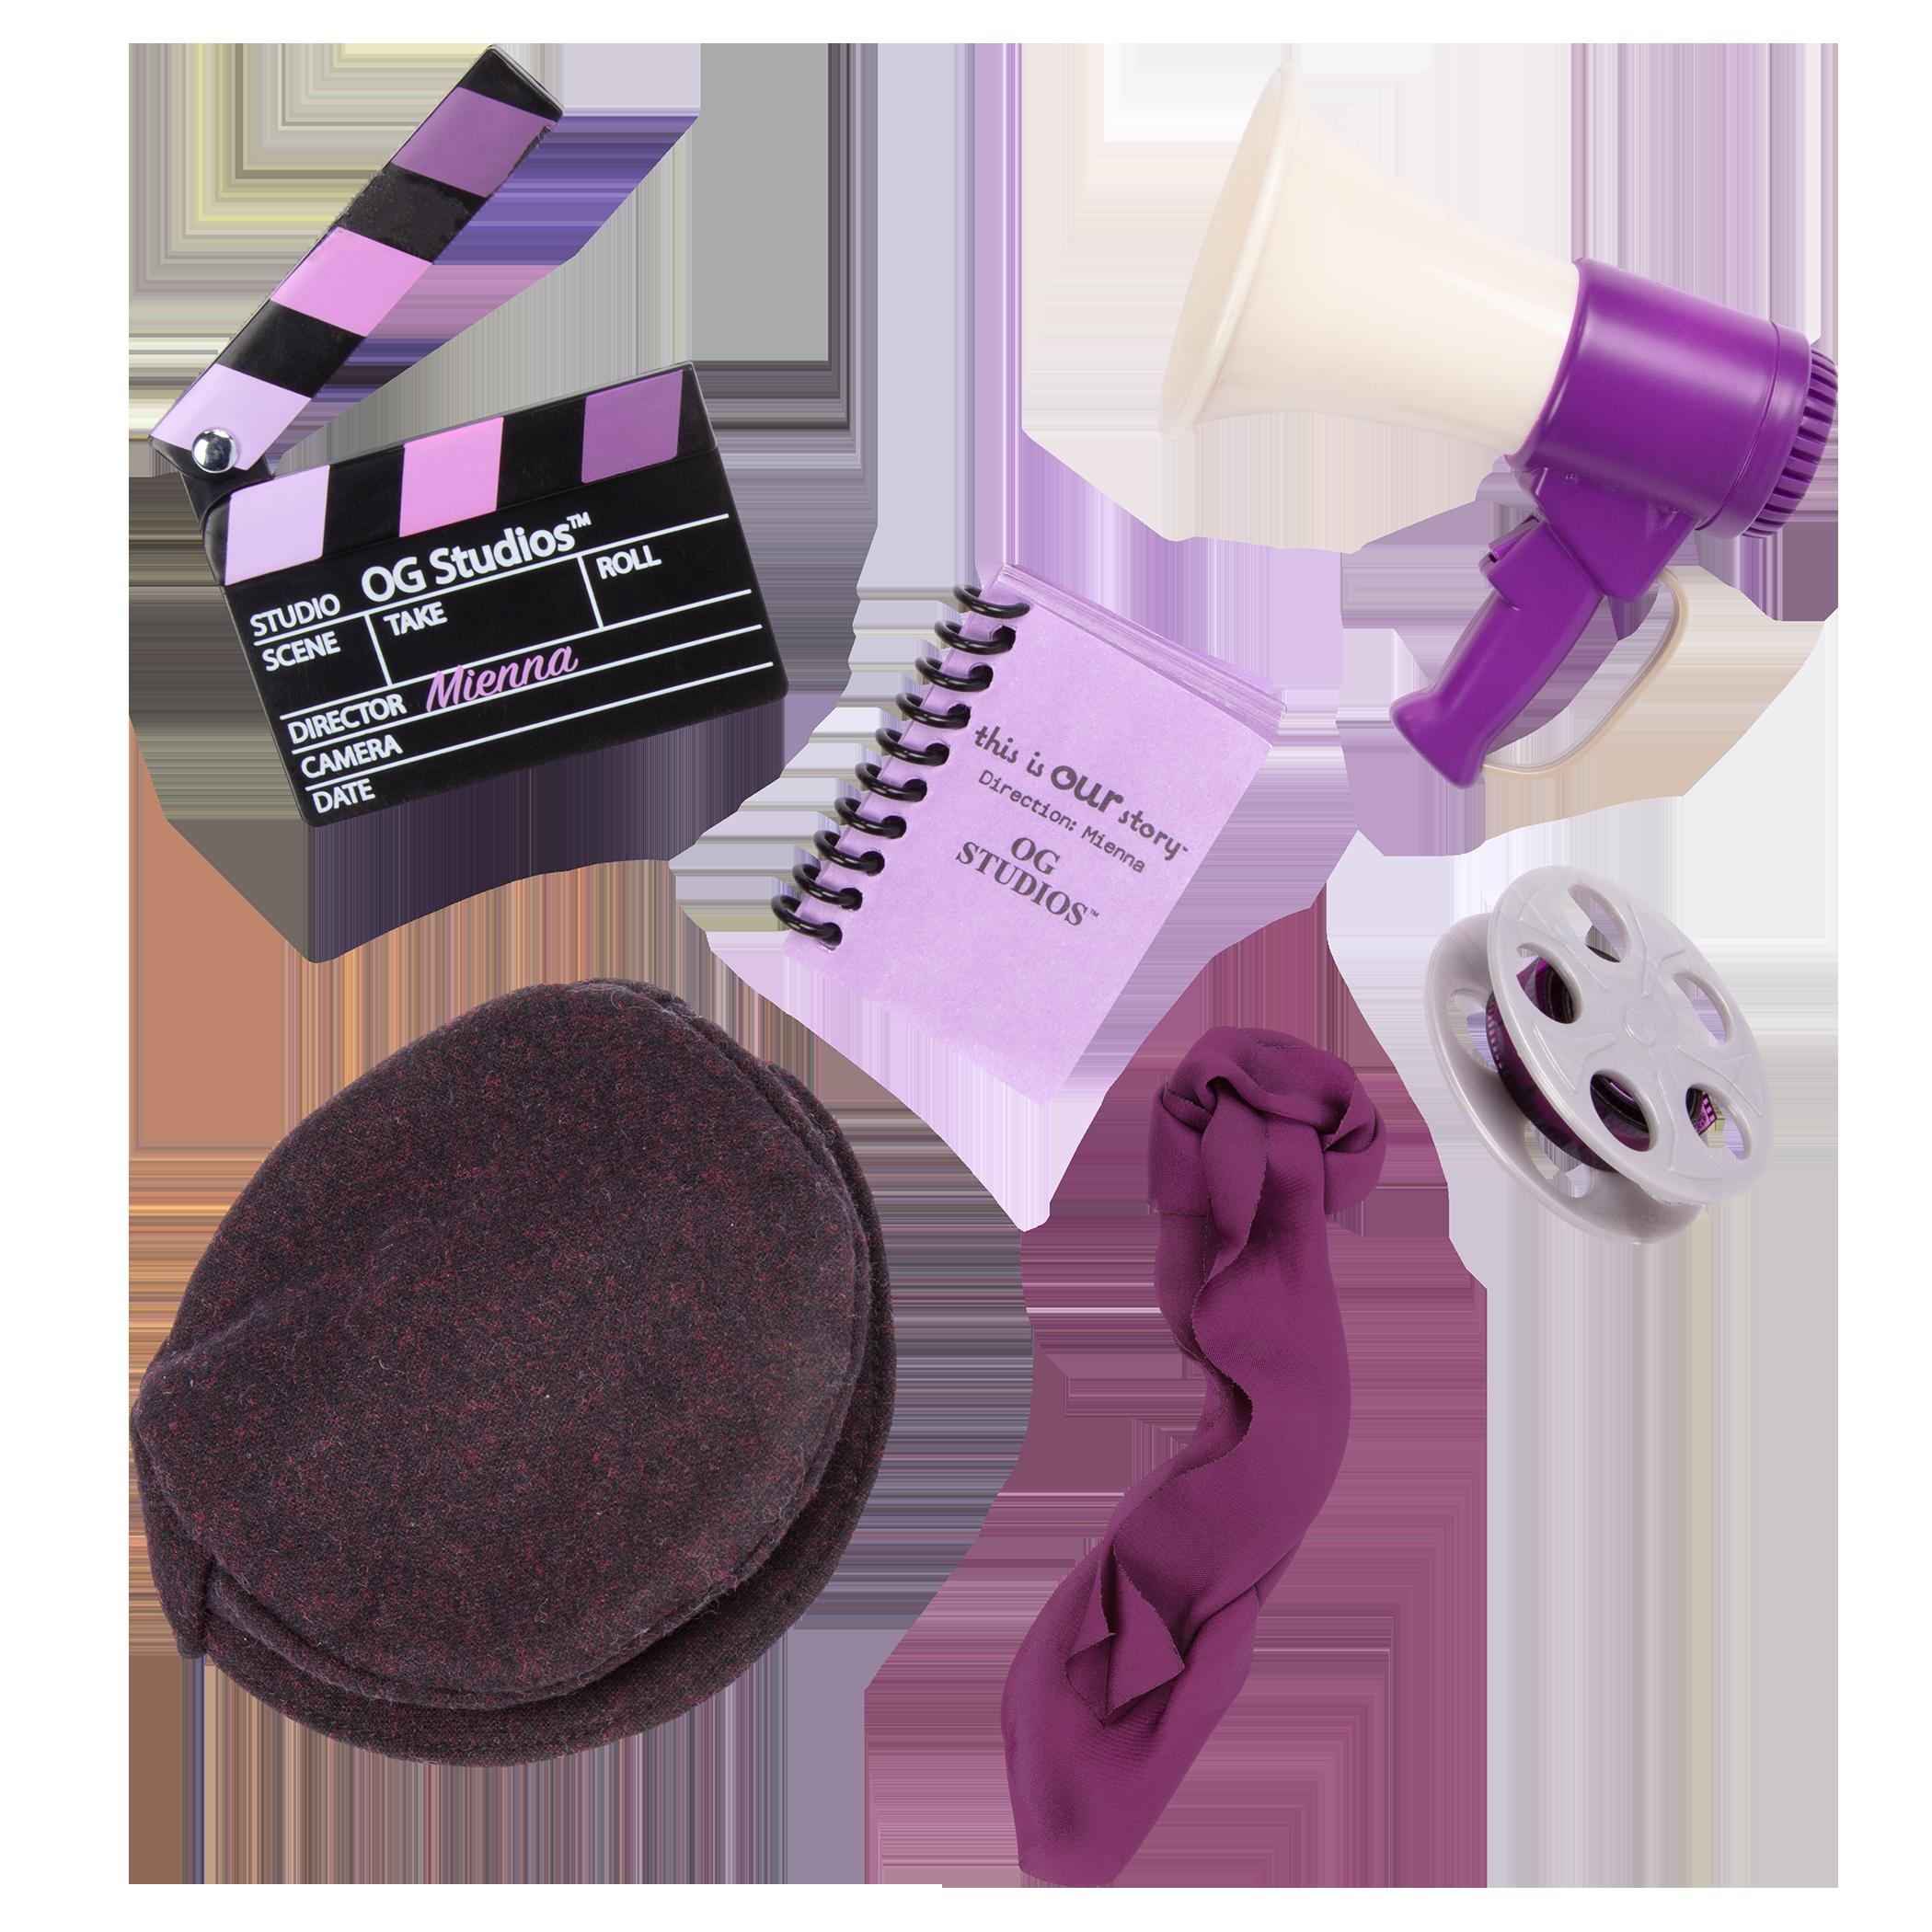 Detail of movie accessories